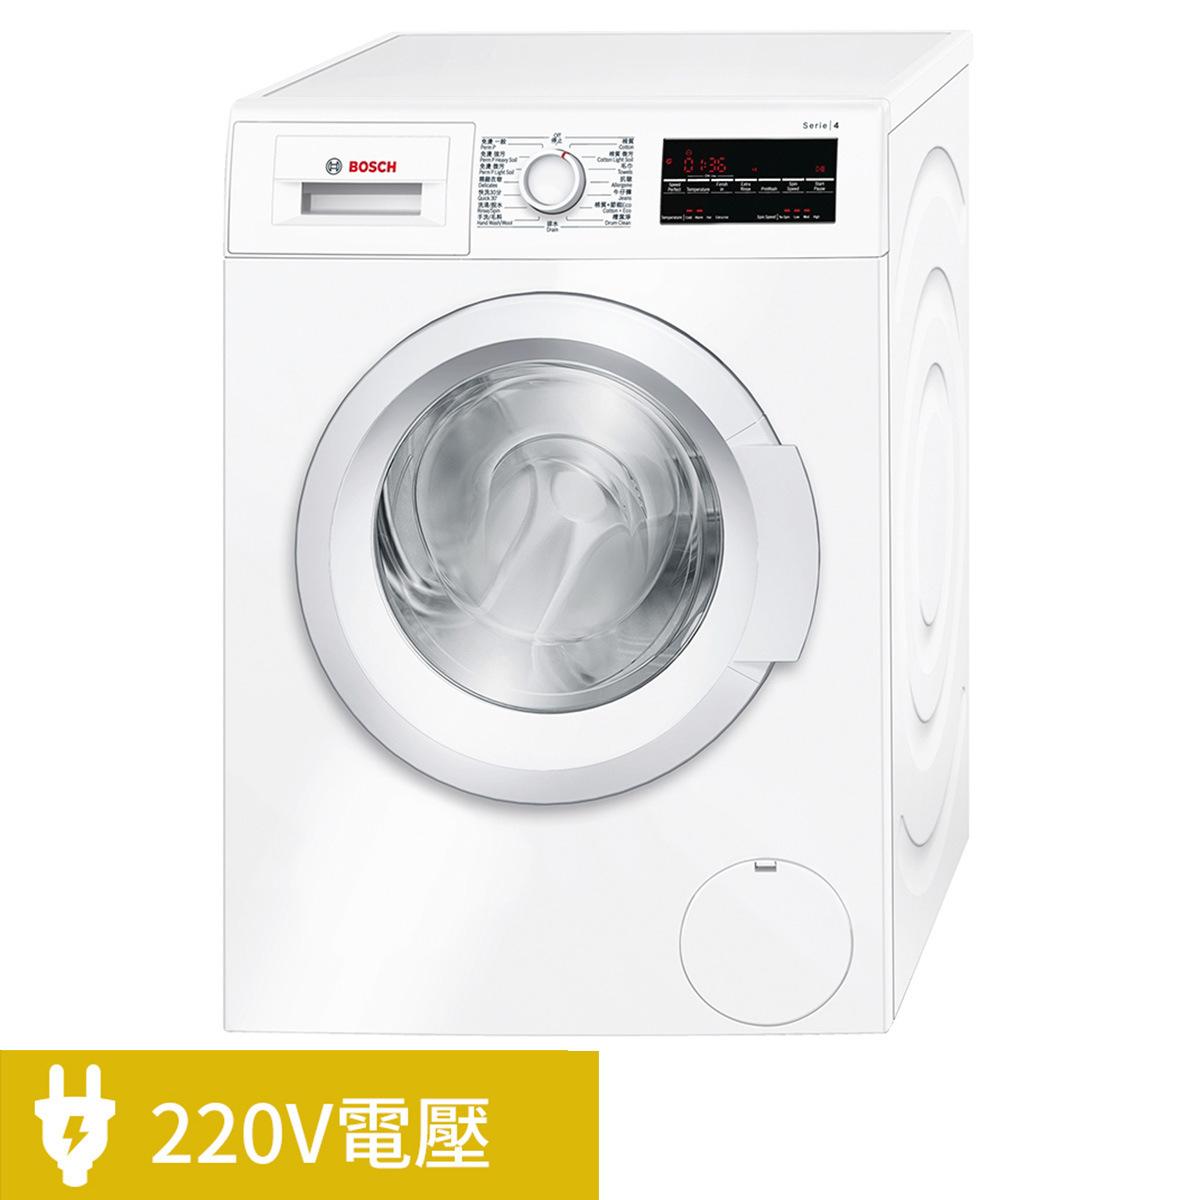 BOSCH 7KG 獨立式洗衣機 WAT28400TC